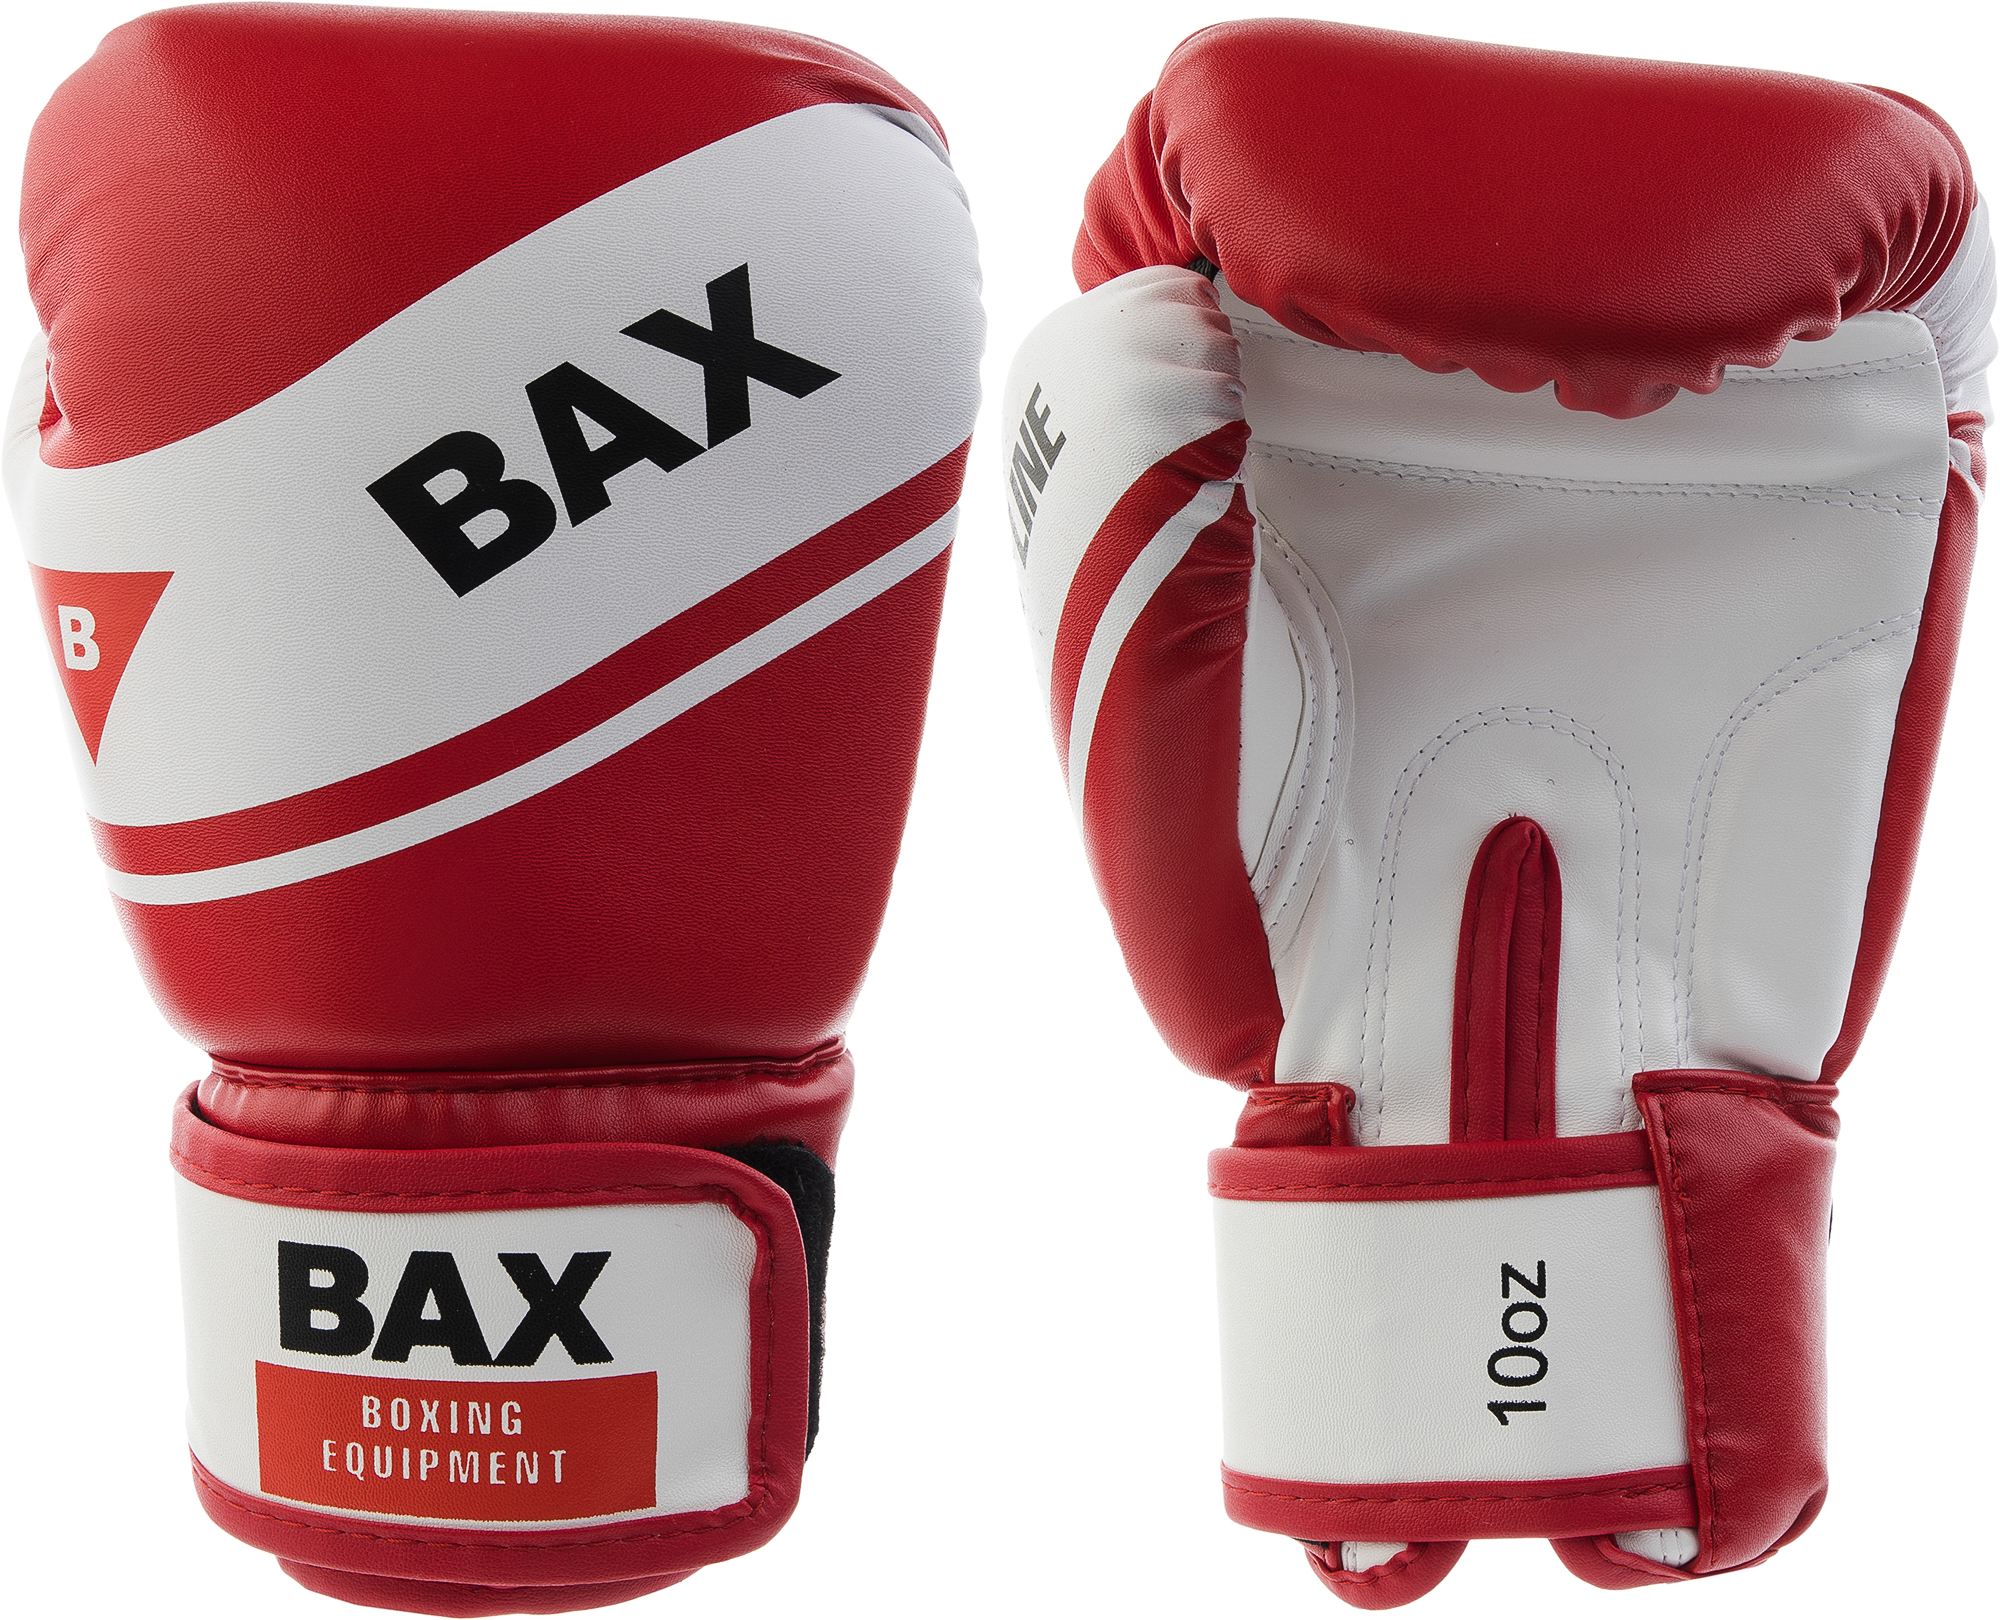 все цены на Bax Перчатки боксерские BAX, размер 10 oz онлайн